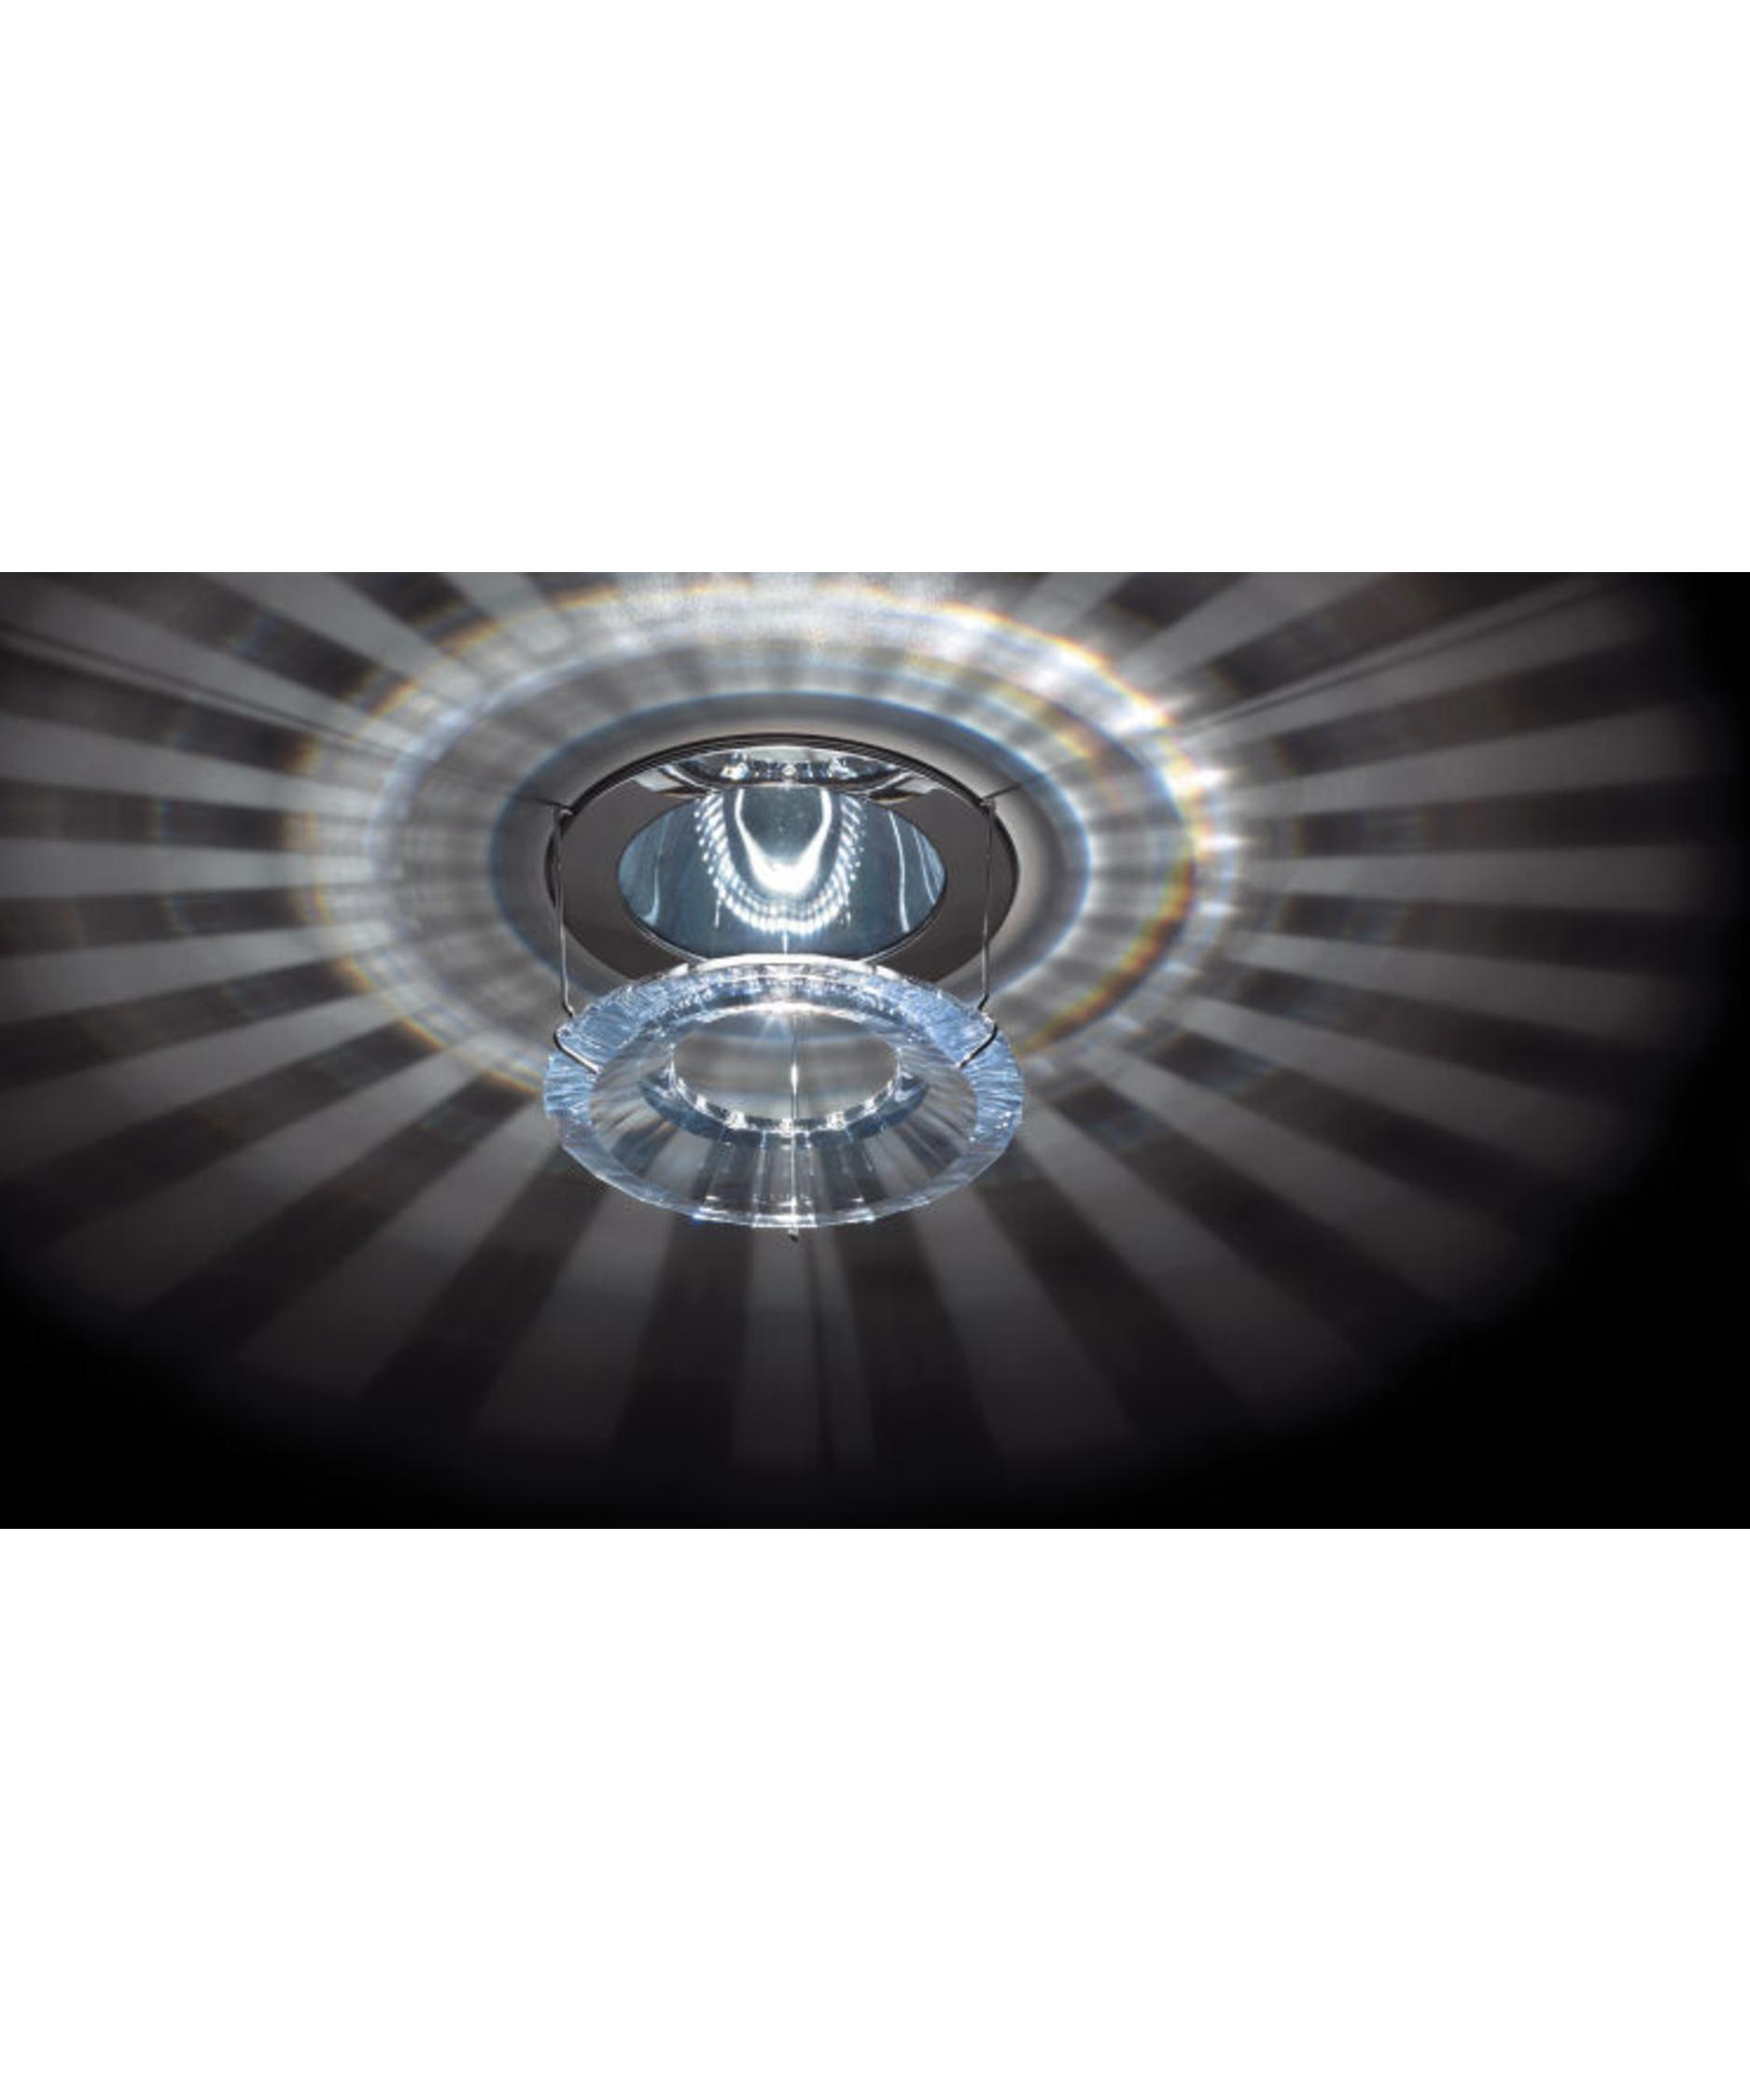 Swarovski A8992nr000206 Noblesse Recessed Lighting Trim